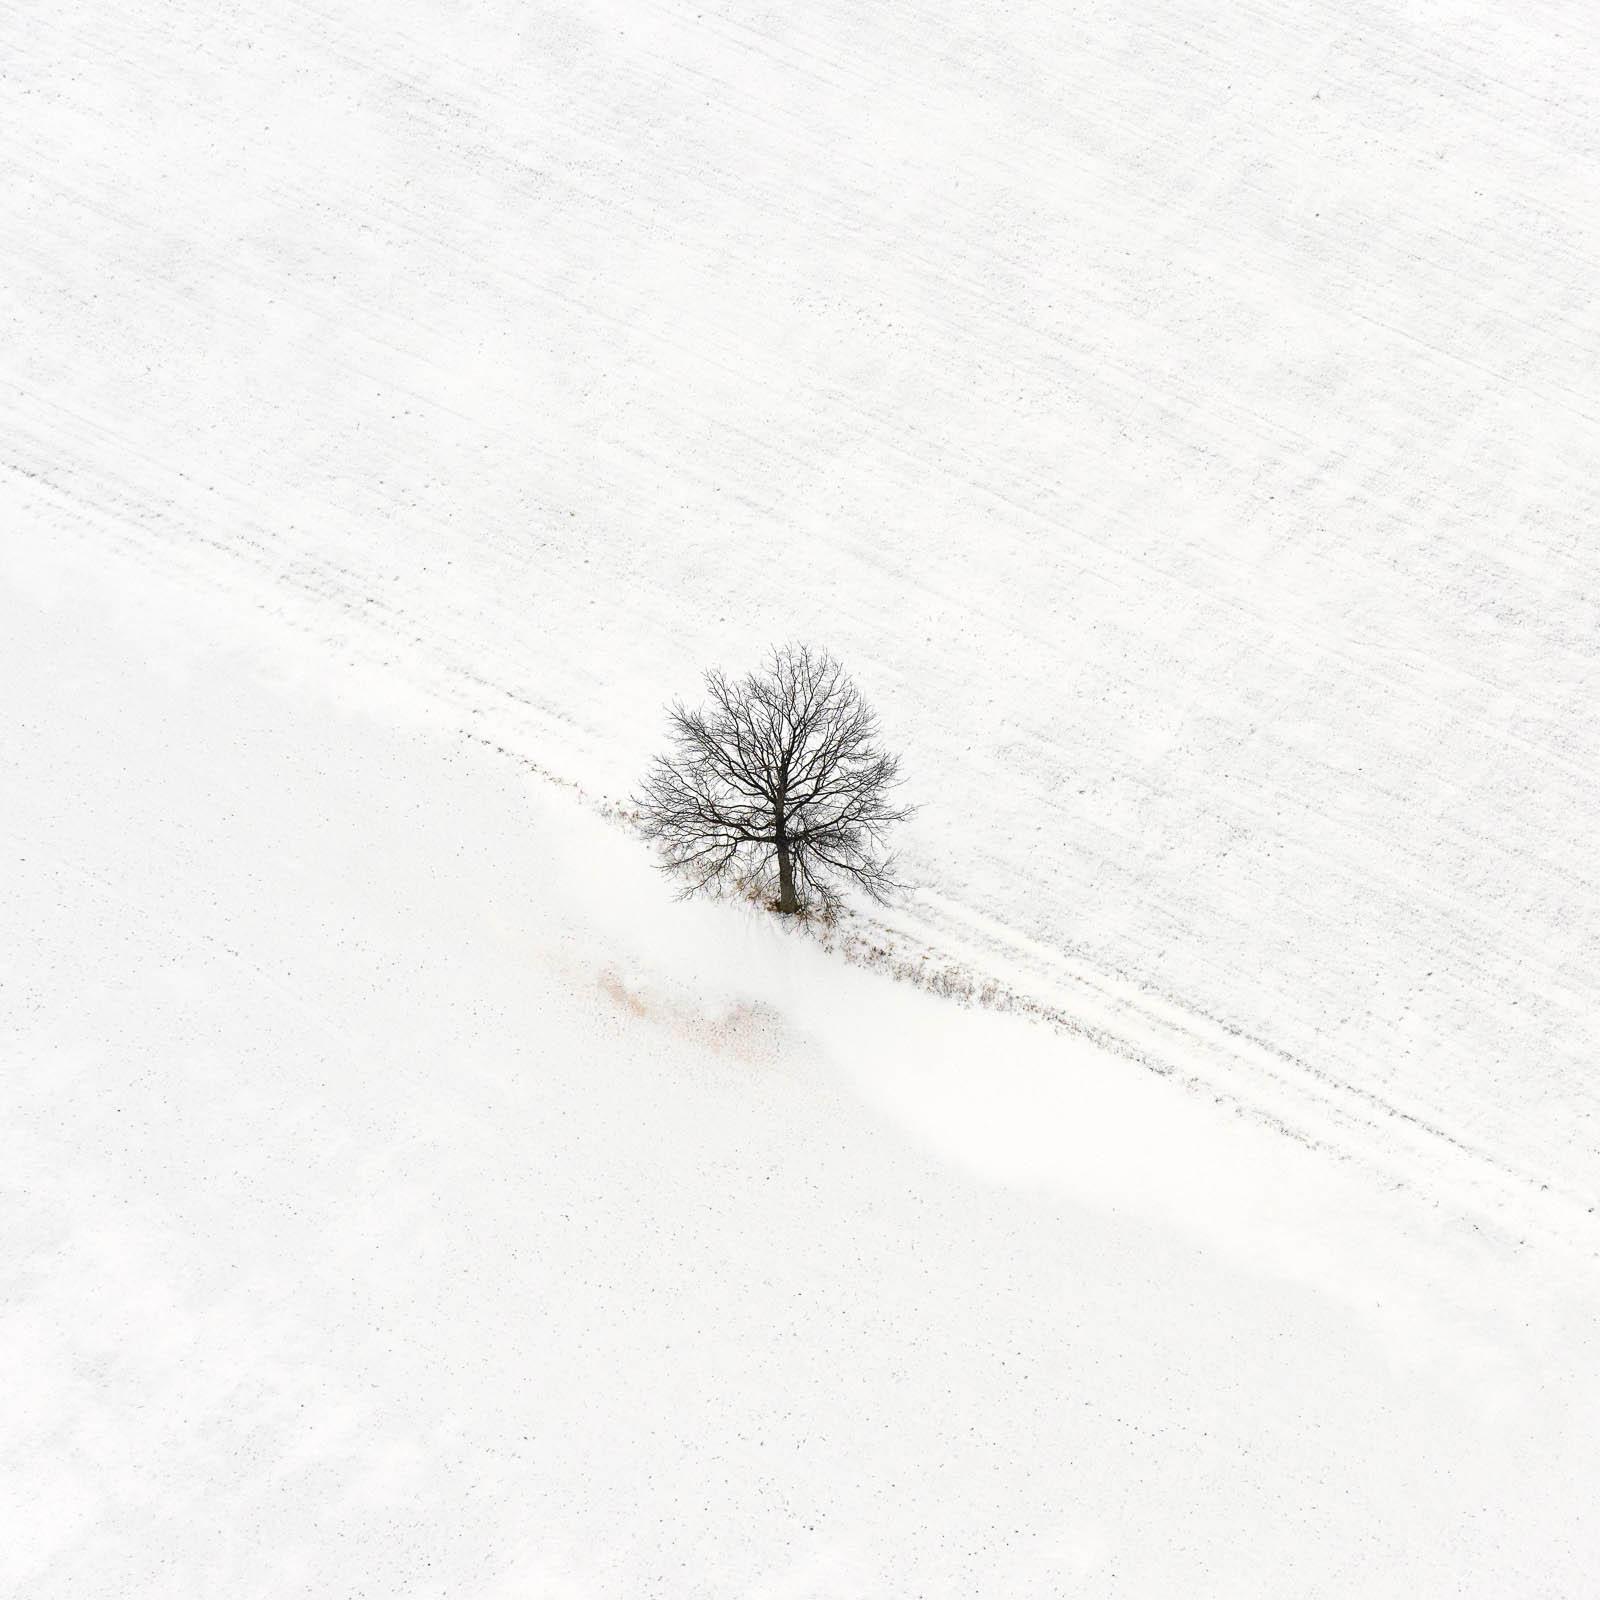 01 Lone Tree